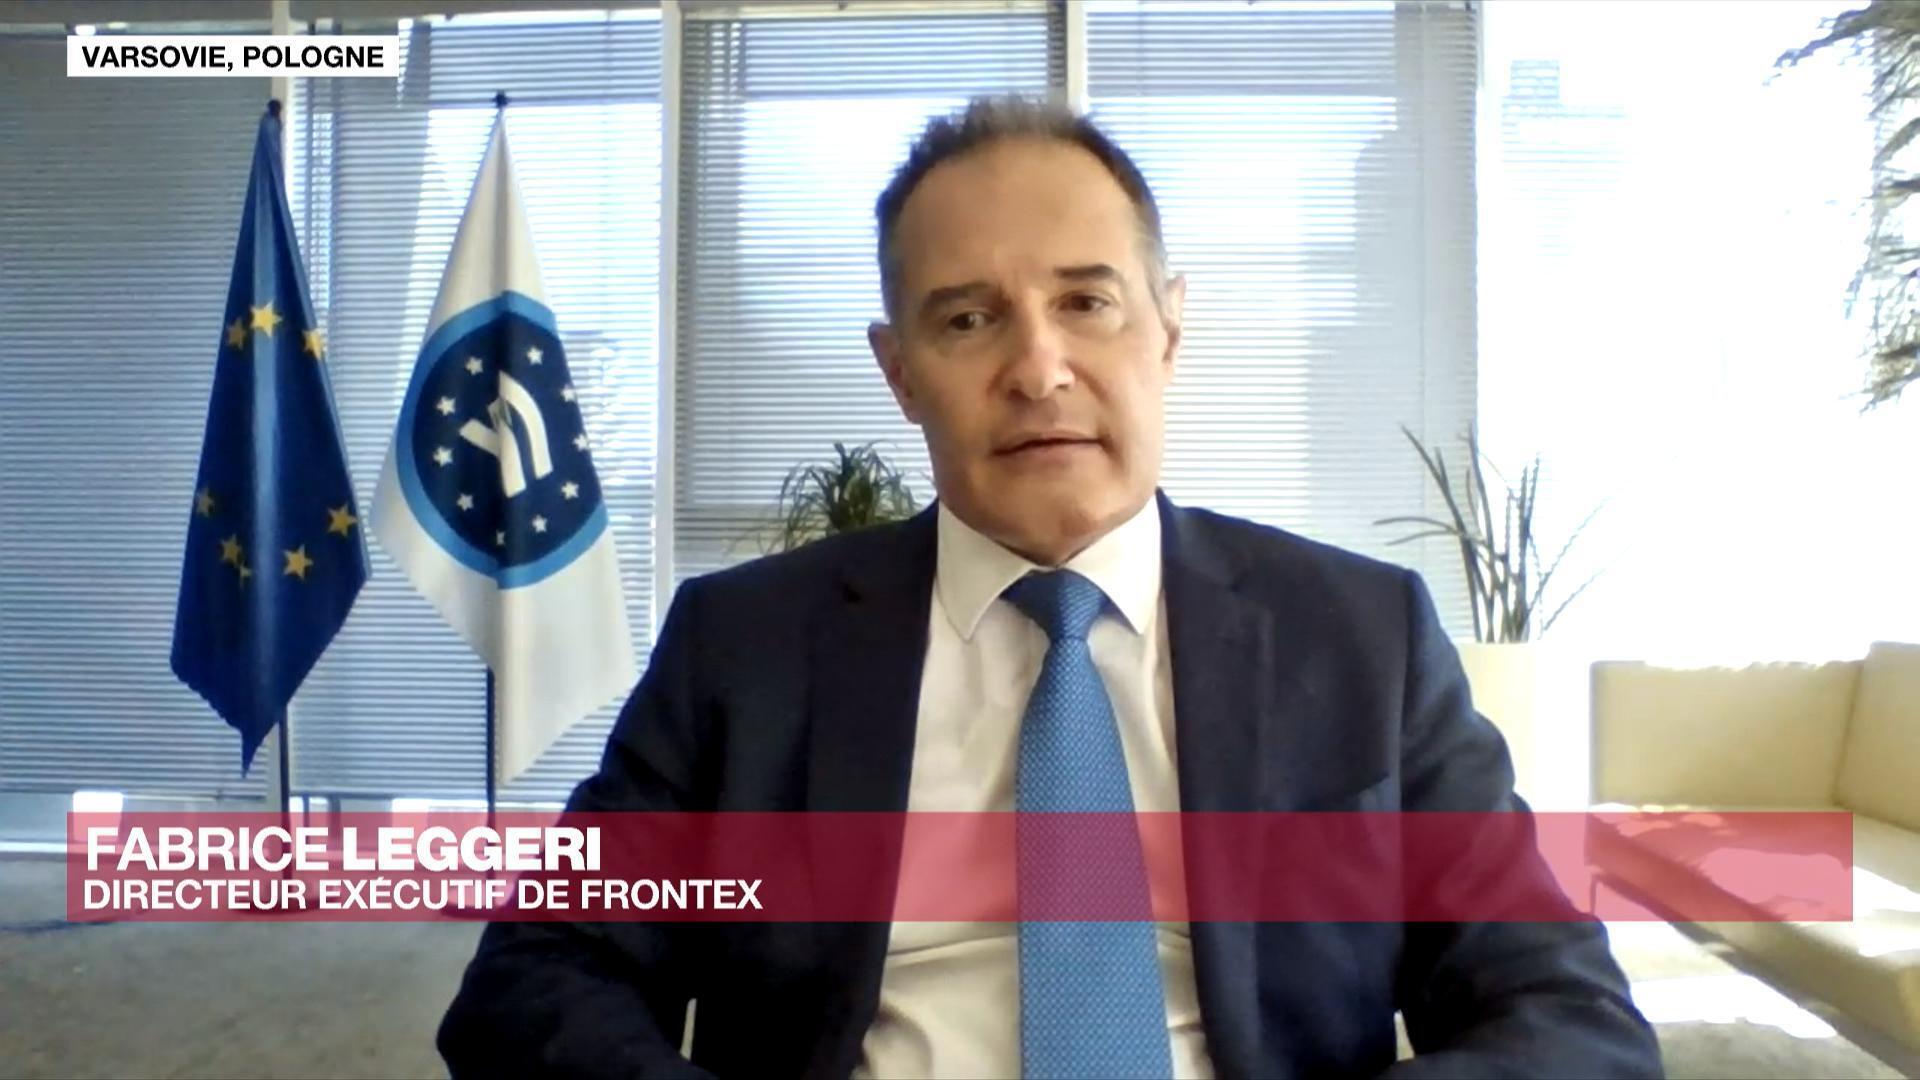 Fabrice Leggeri, directeur exécutif de Frontex